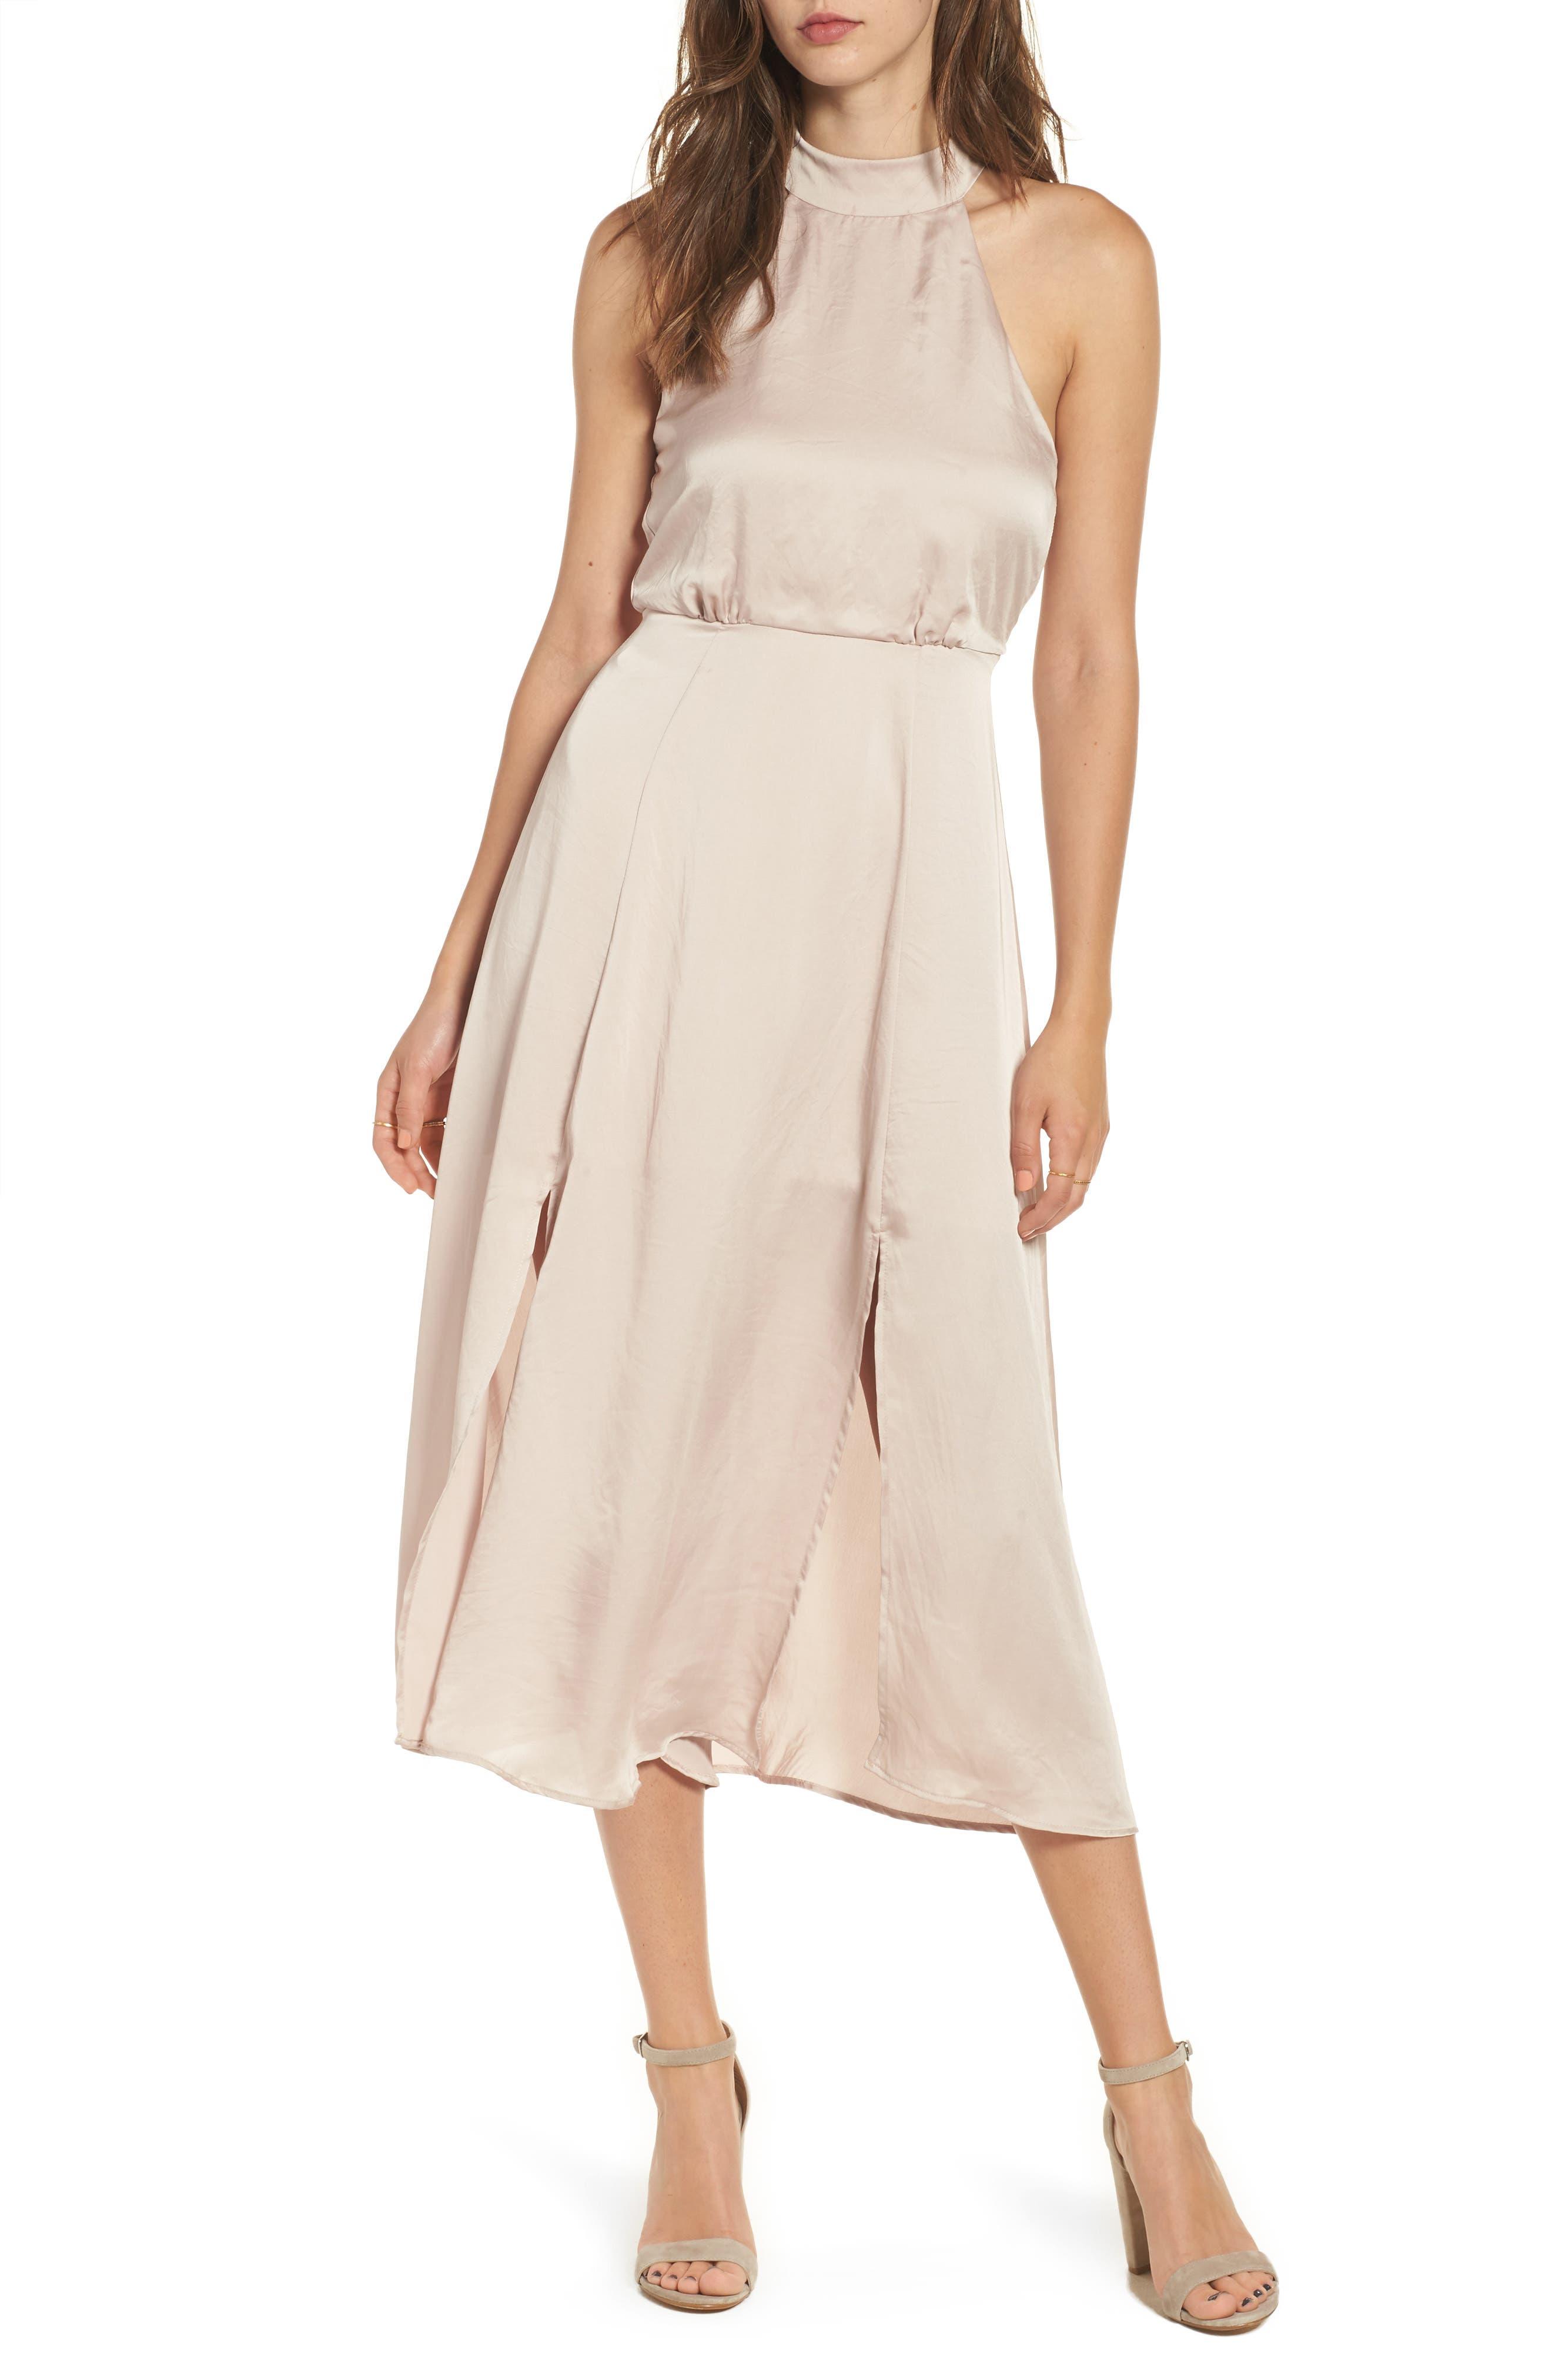 Alternate Image 1 Selected - ASTR the Label Satin Midi Dress